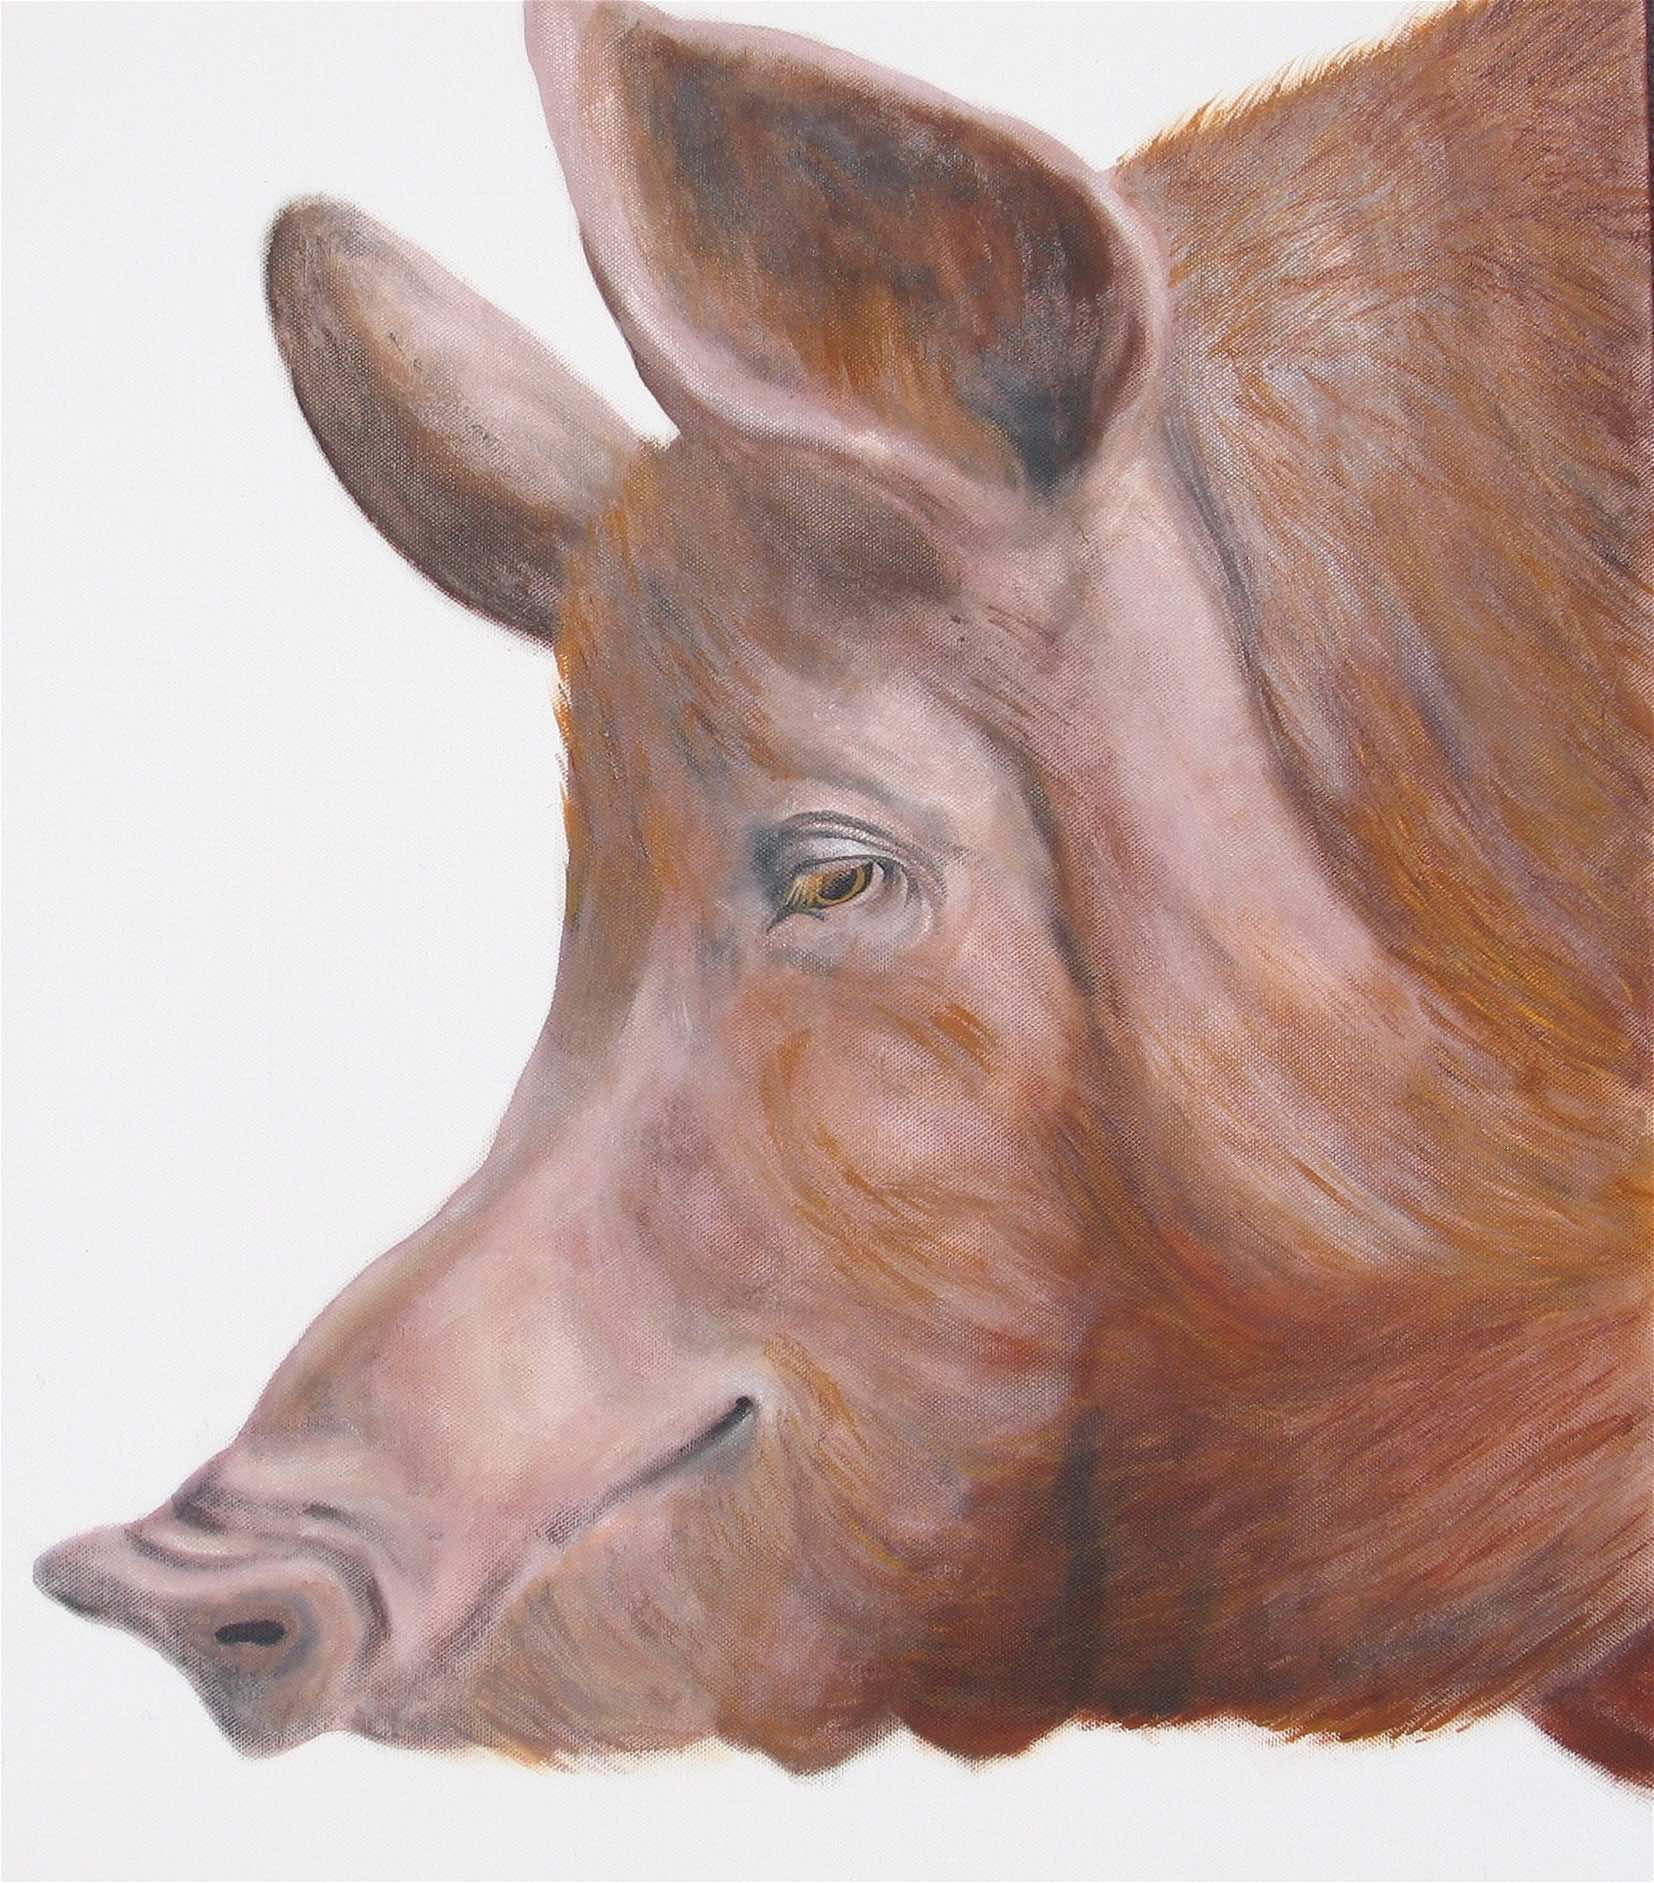 Pig : 80 X 80 cm oil on canvas